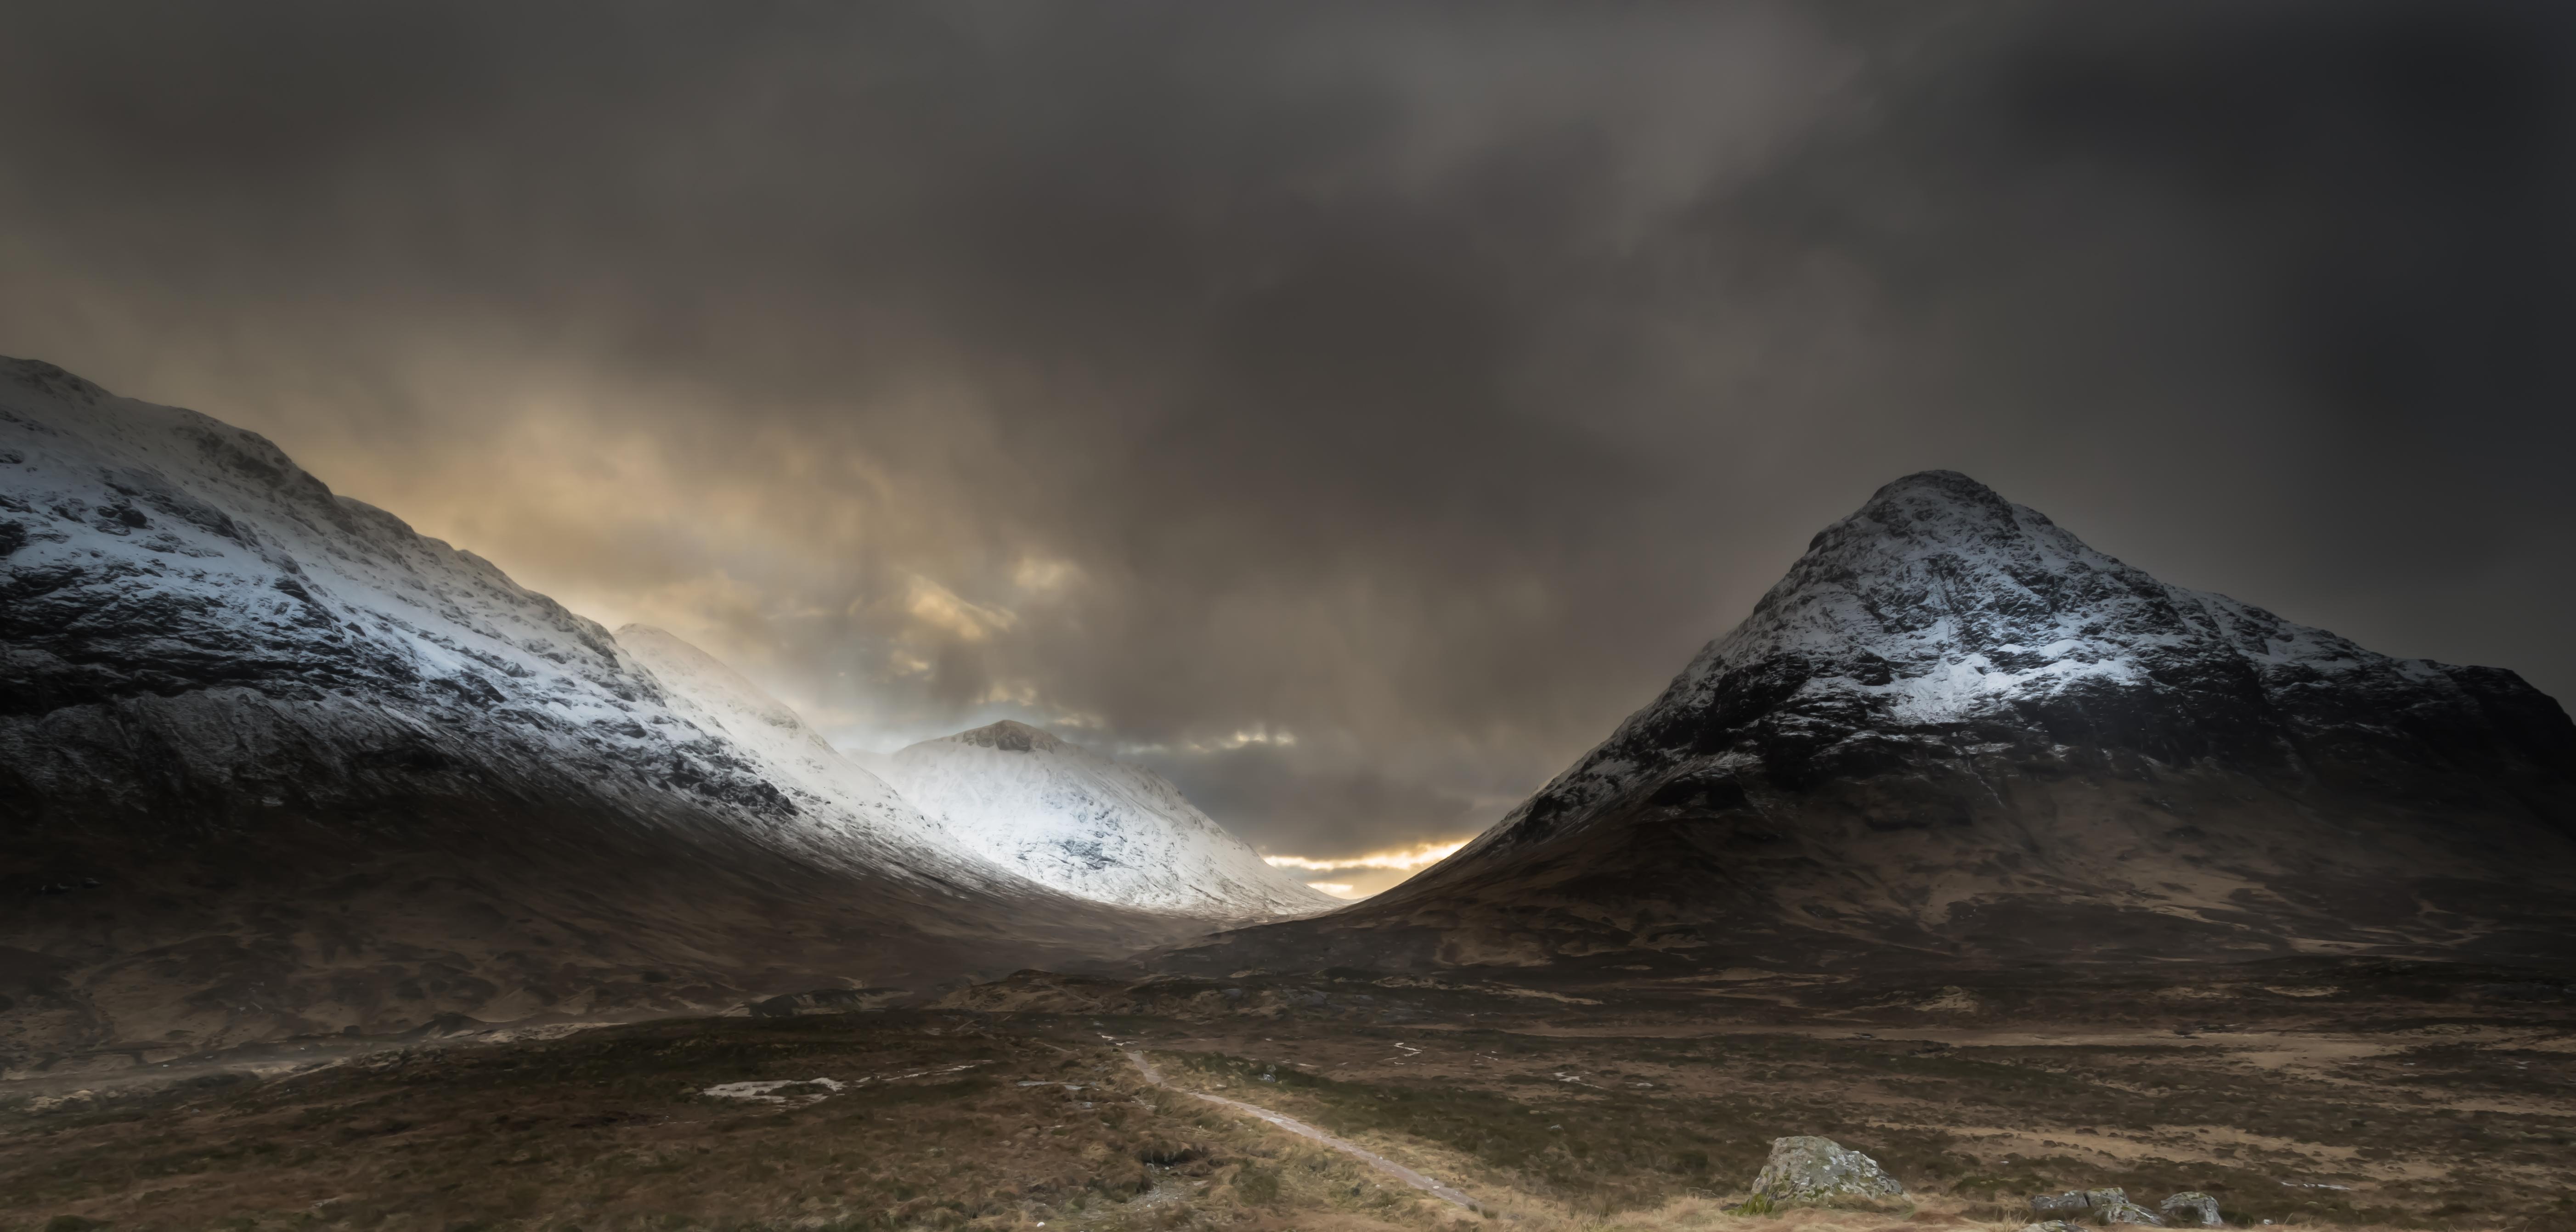 Wallpaper Mountain Snow Winter Atmosphere Moody